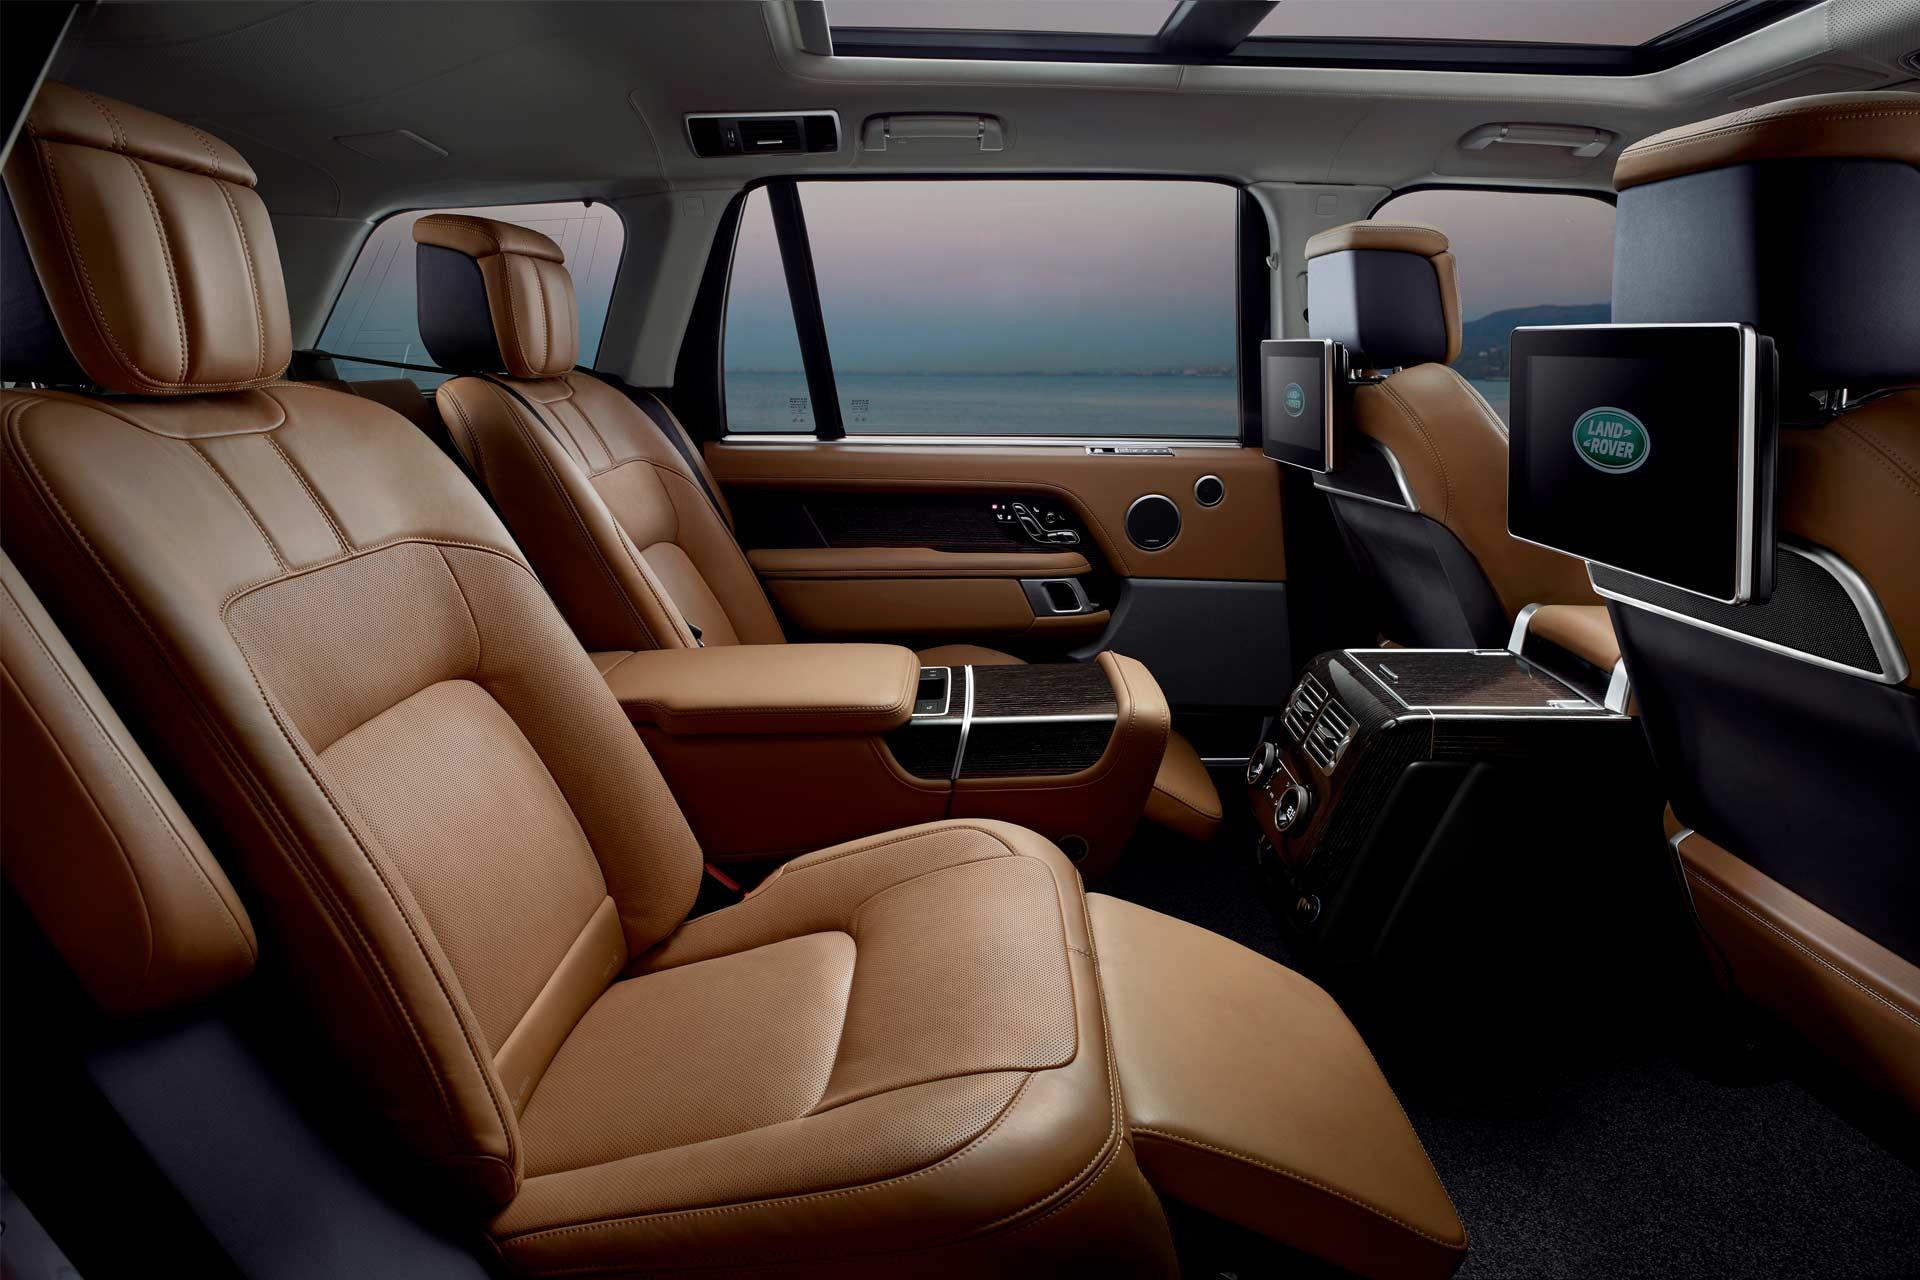 2018-Range-Rover-interior_3